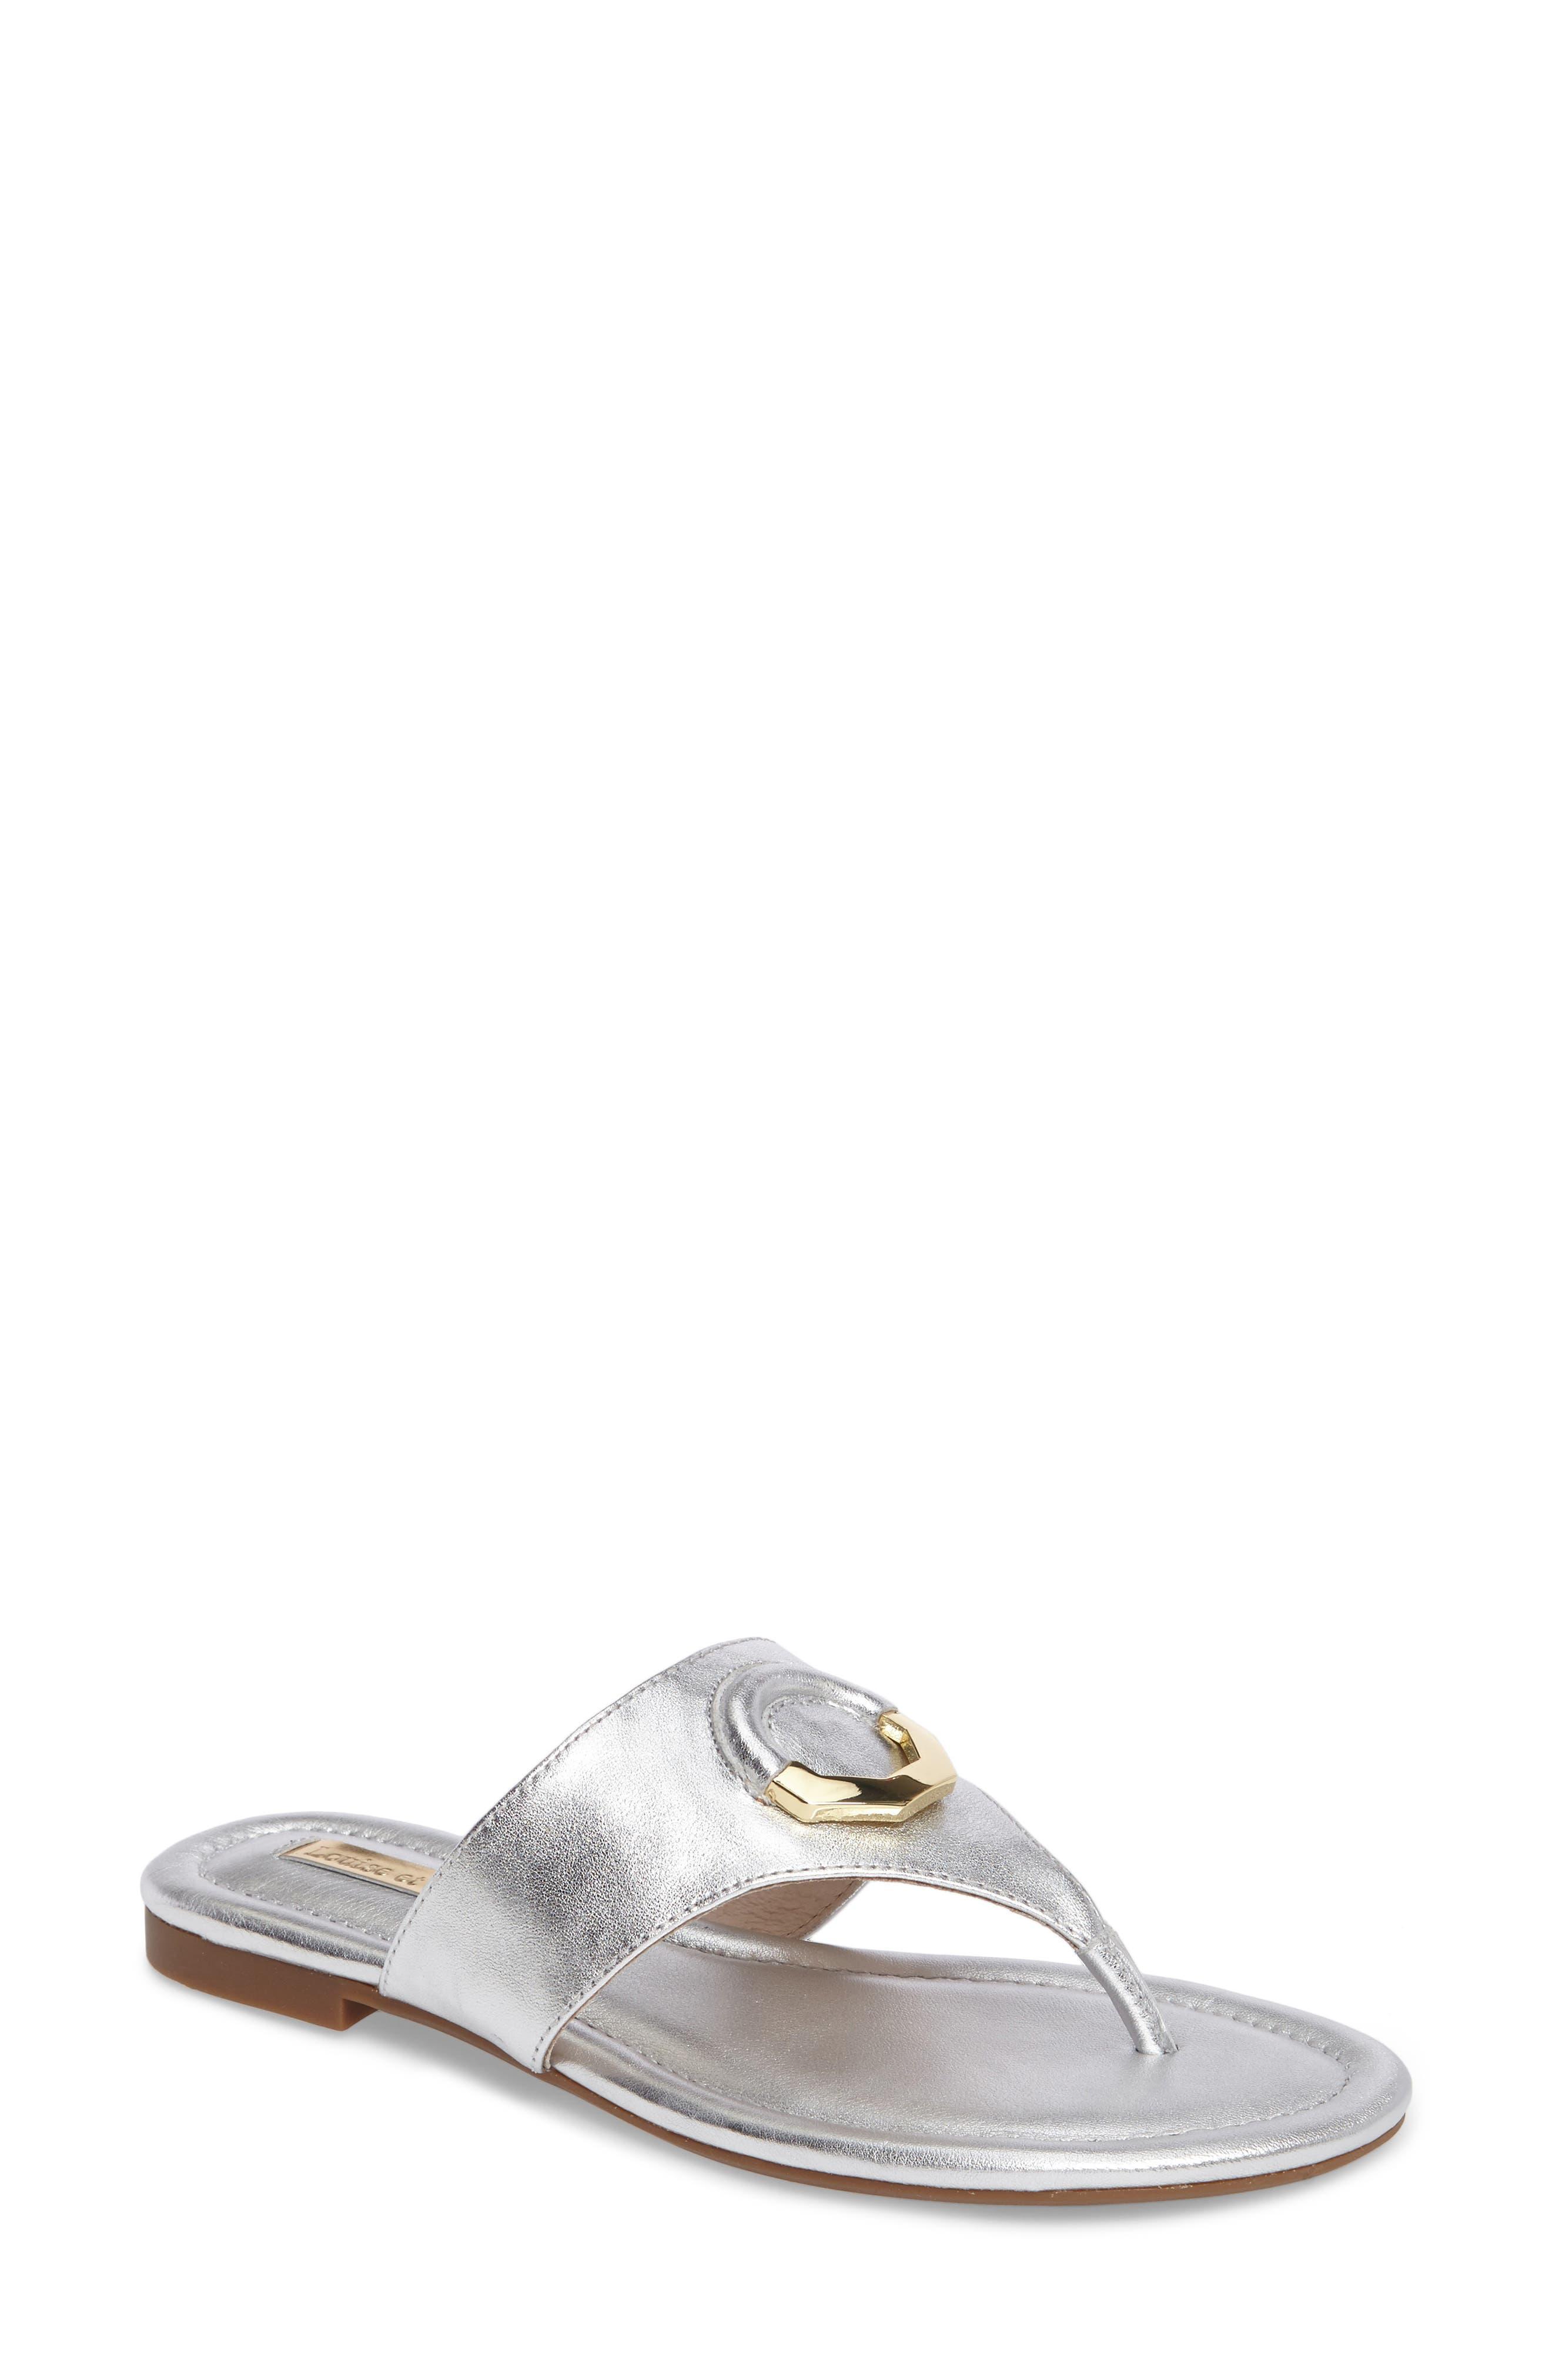 Adana Flip Flop,                             Main thumbnail 1, color,                             Sterling Leather